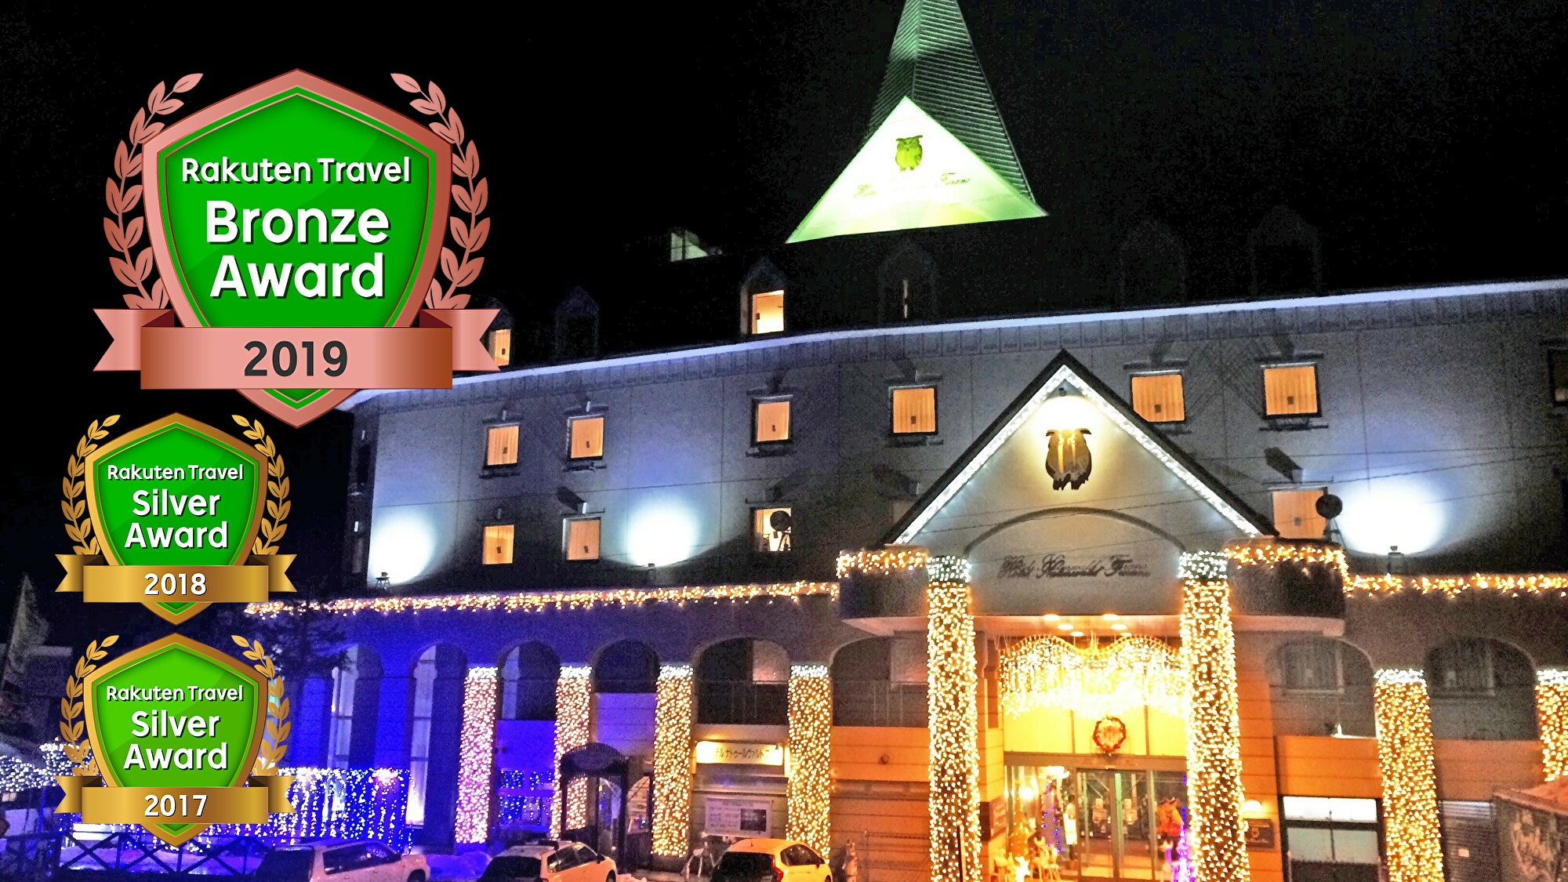 6f969571a4 ホテル ナトゥールヴァルト富良野奇跡の景色を持つ富良野、その景色を一望できる小高い丘の上に建つプチリゾートホテルです。